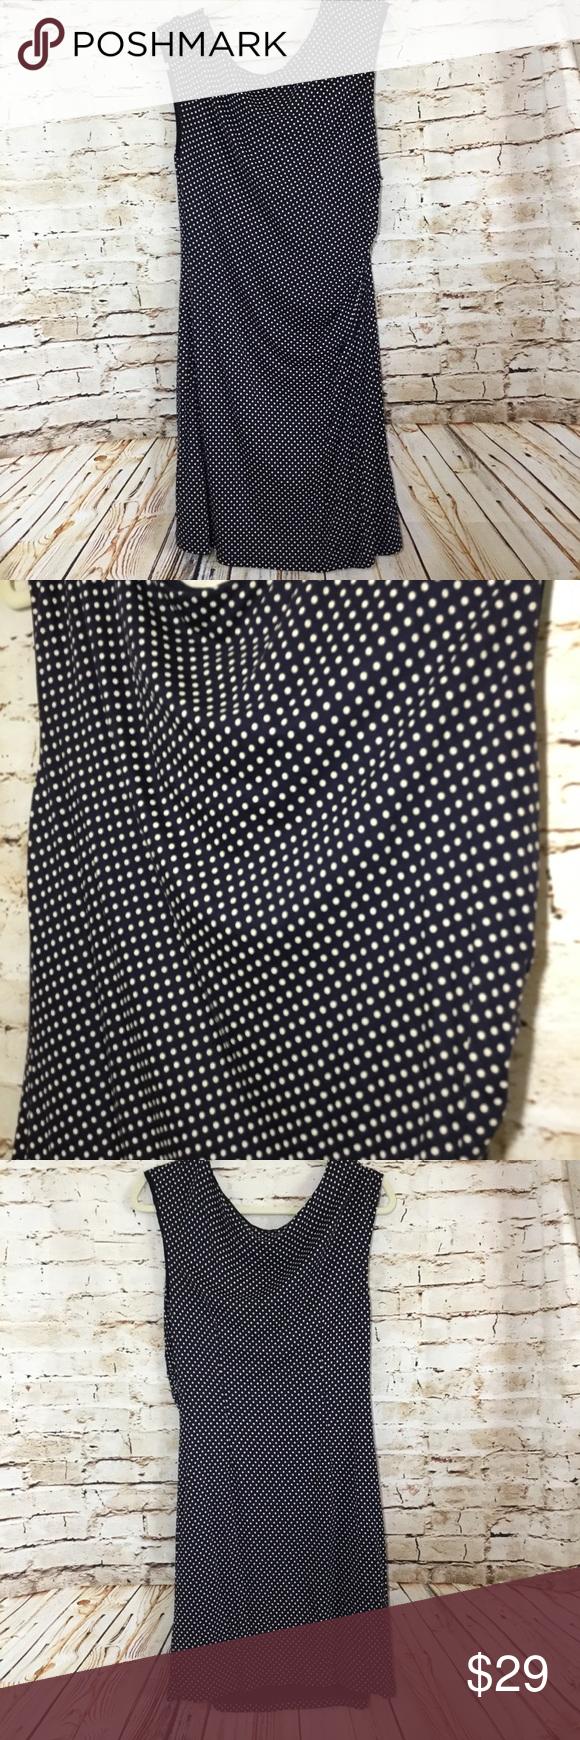 Loft Polka Dot Dress Ann Taylor LOFT Petite Large Navy